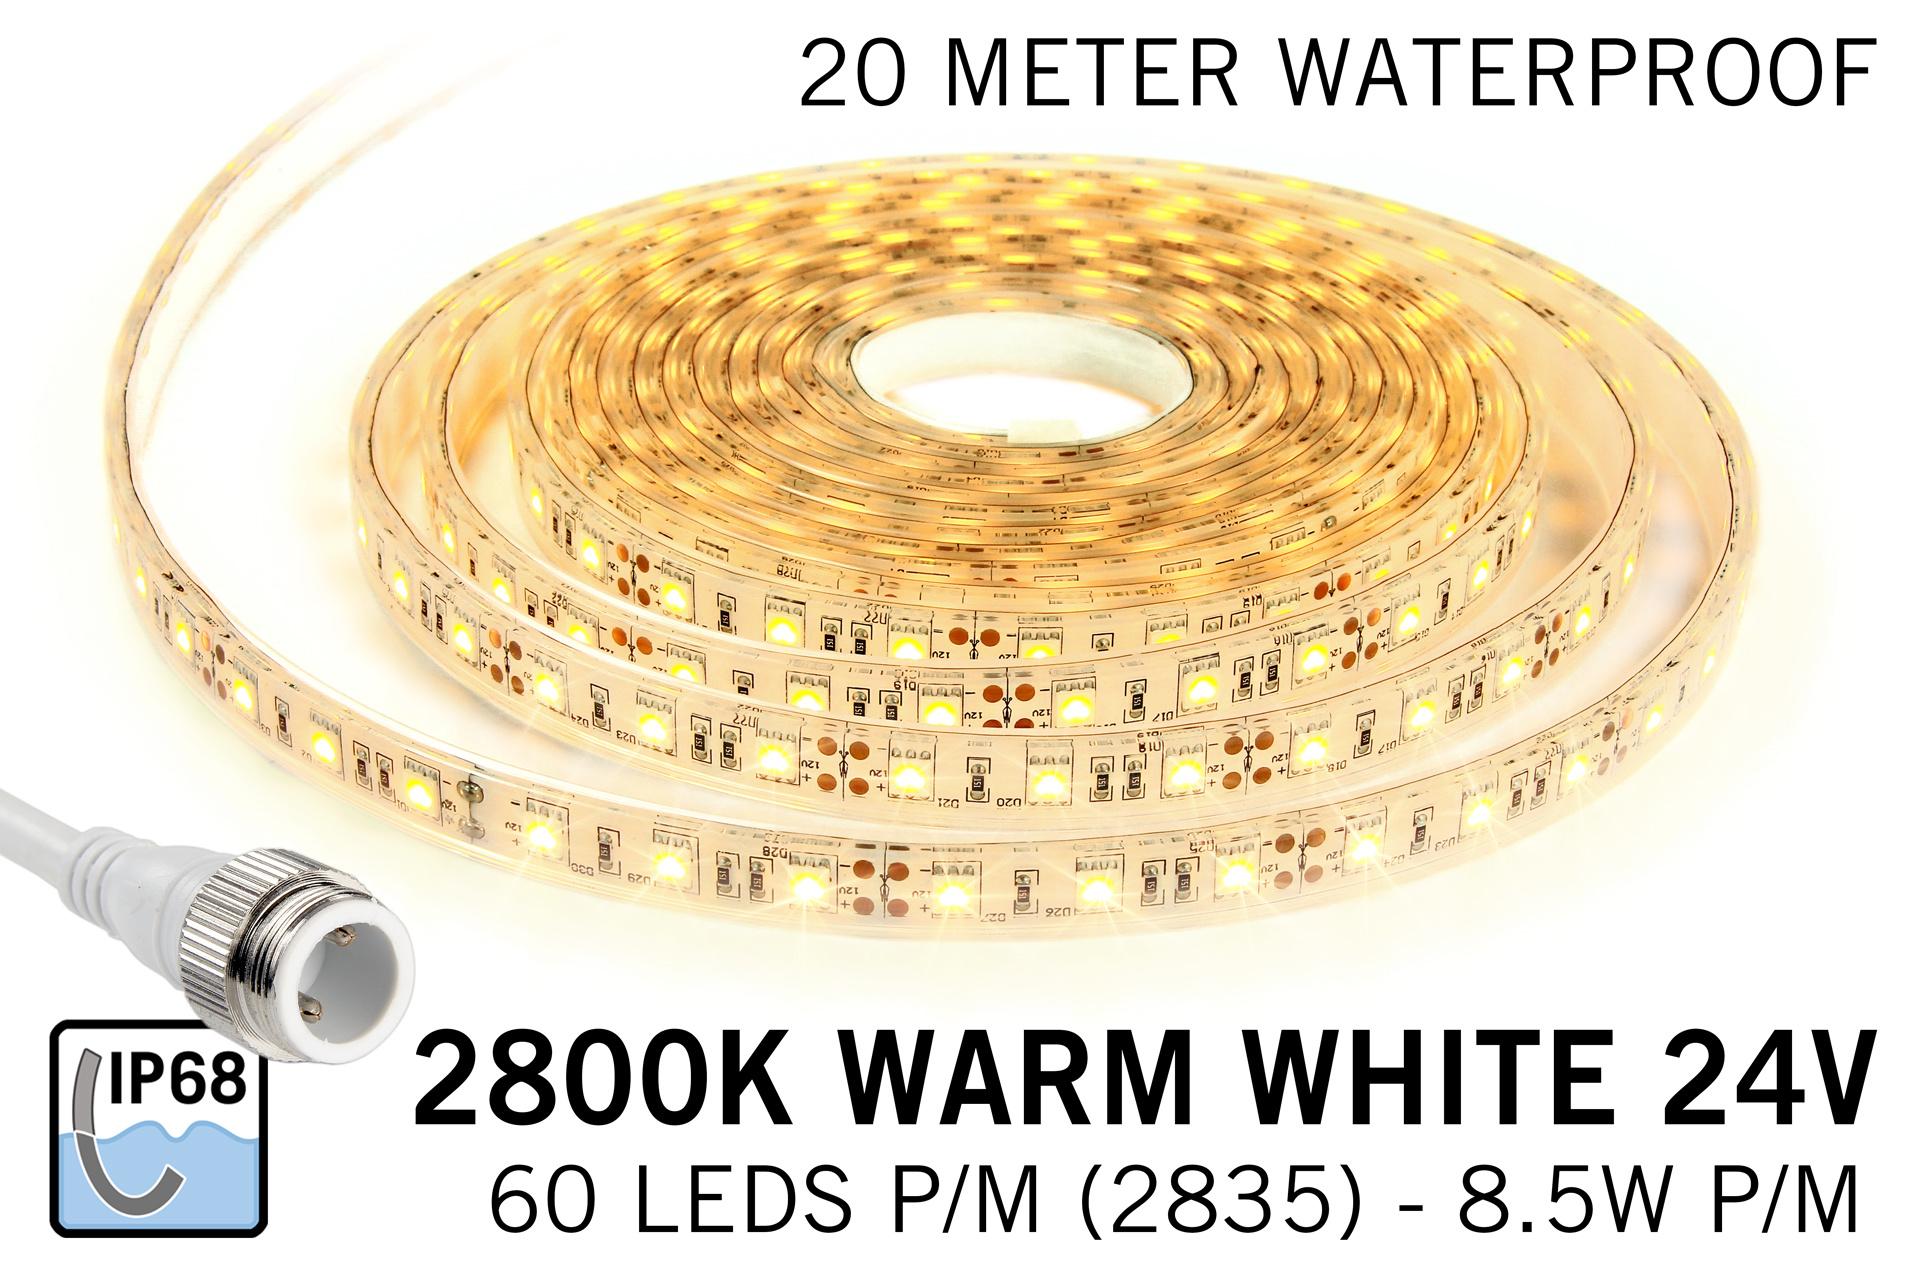 Waterdichte Warm Witte LED strip (IP68) 60 Led's per meter 24Volt, 20 meter lengte